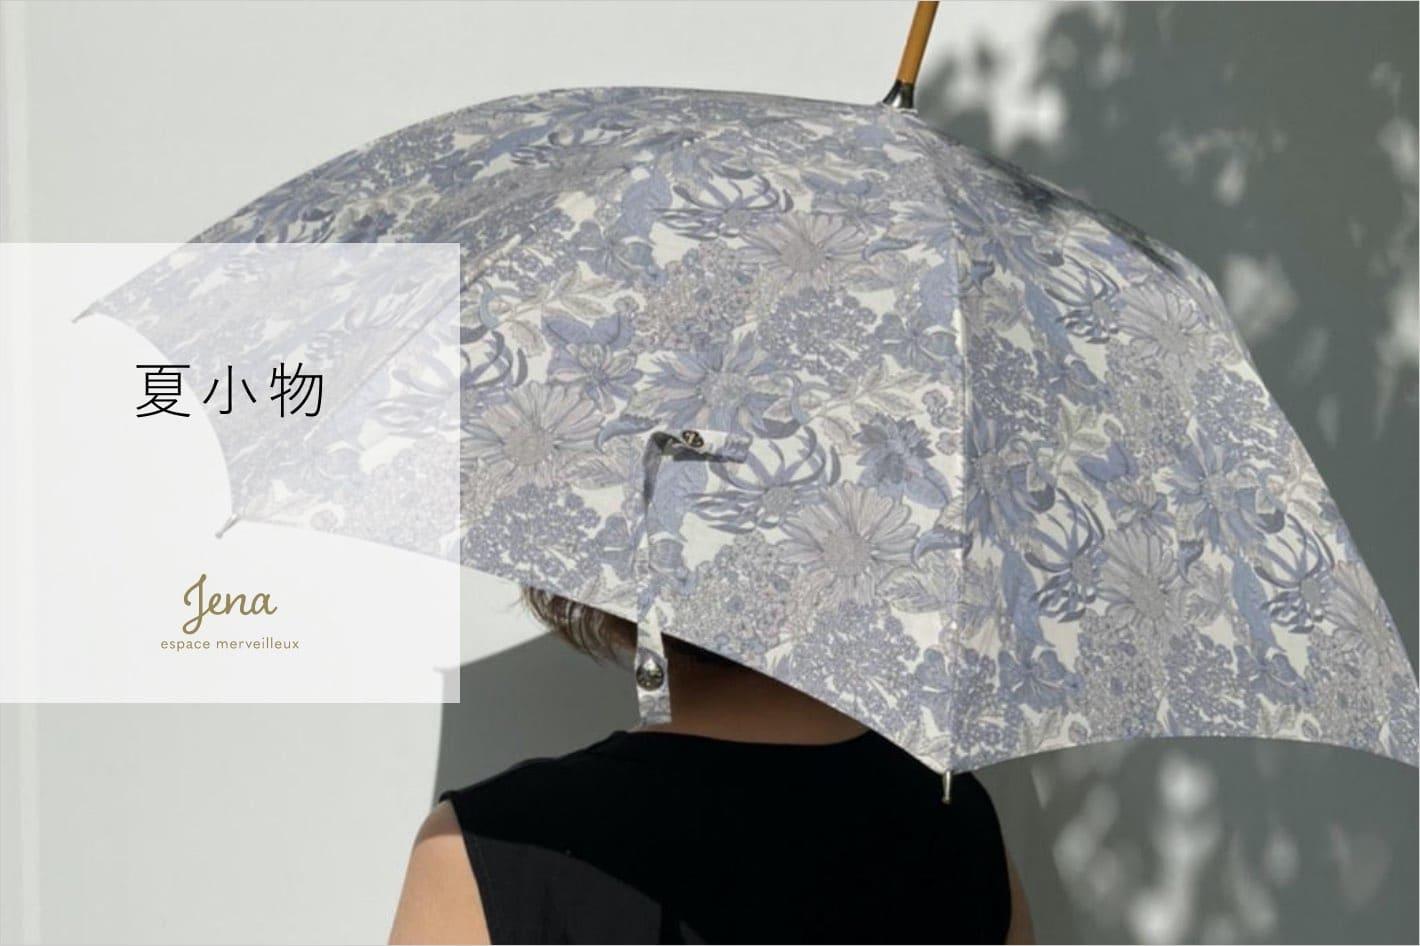 "Jena espace merveilleux 夏小物でおしゃれの""格上げ"""